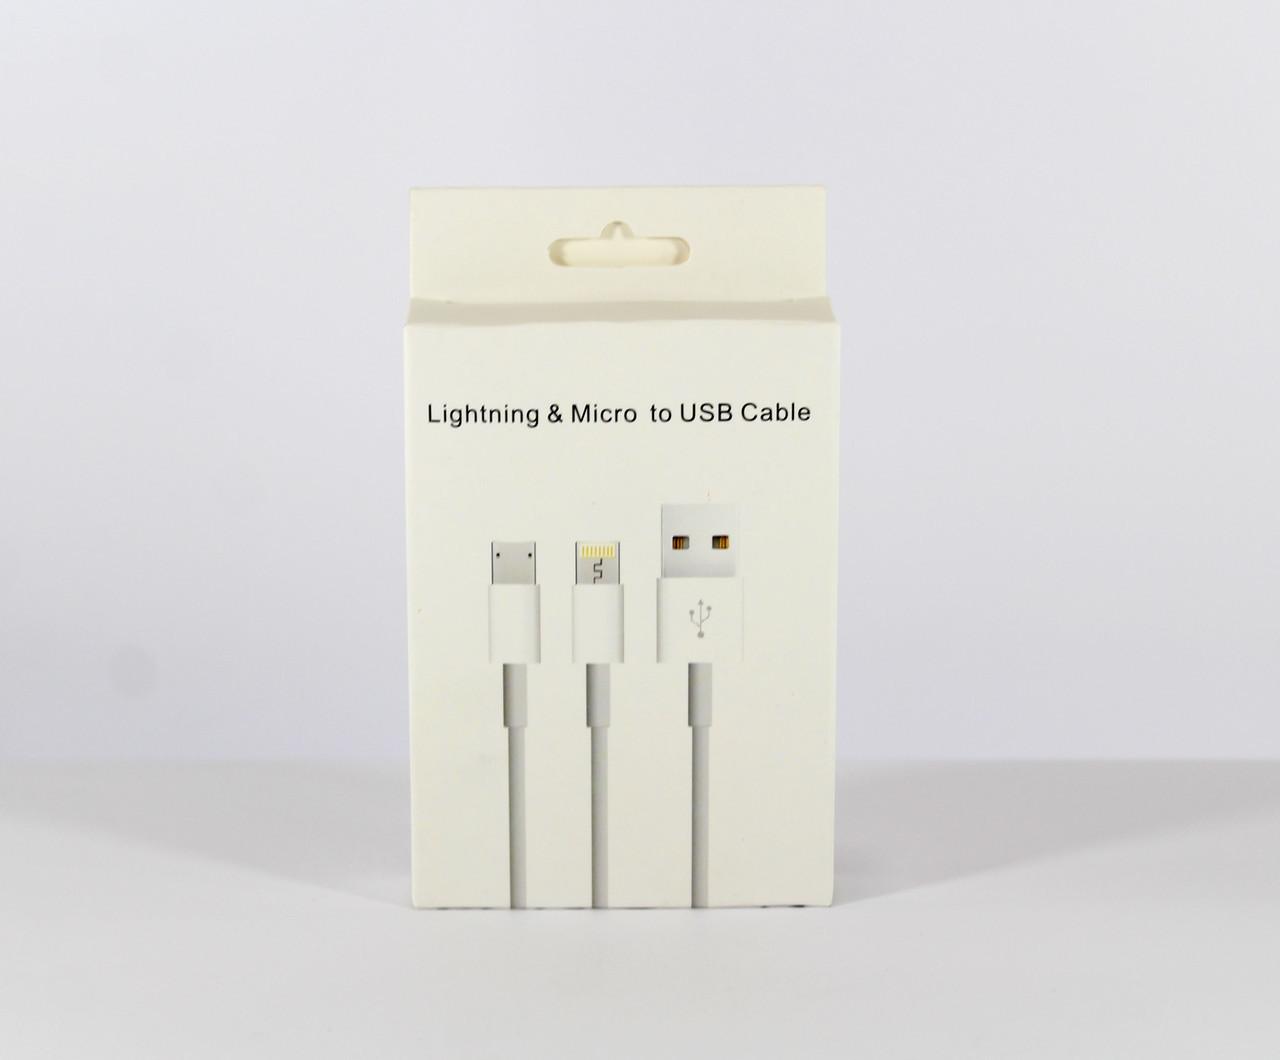 Шнур для моб. Two Sides micro+lightning (500) в уп.500шт.